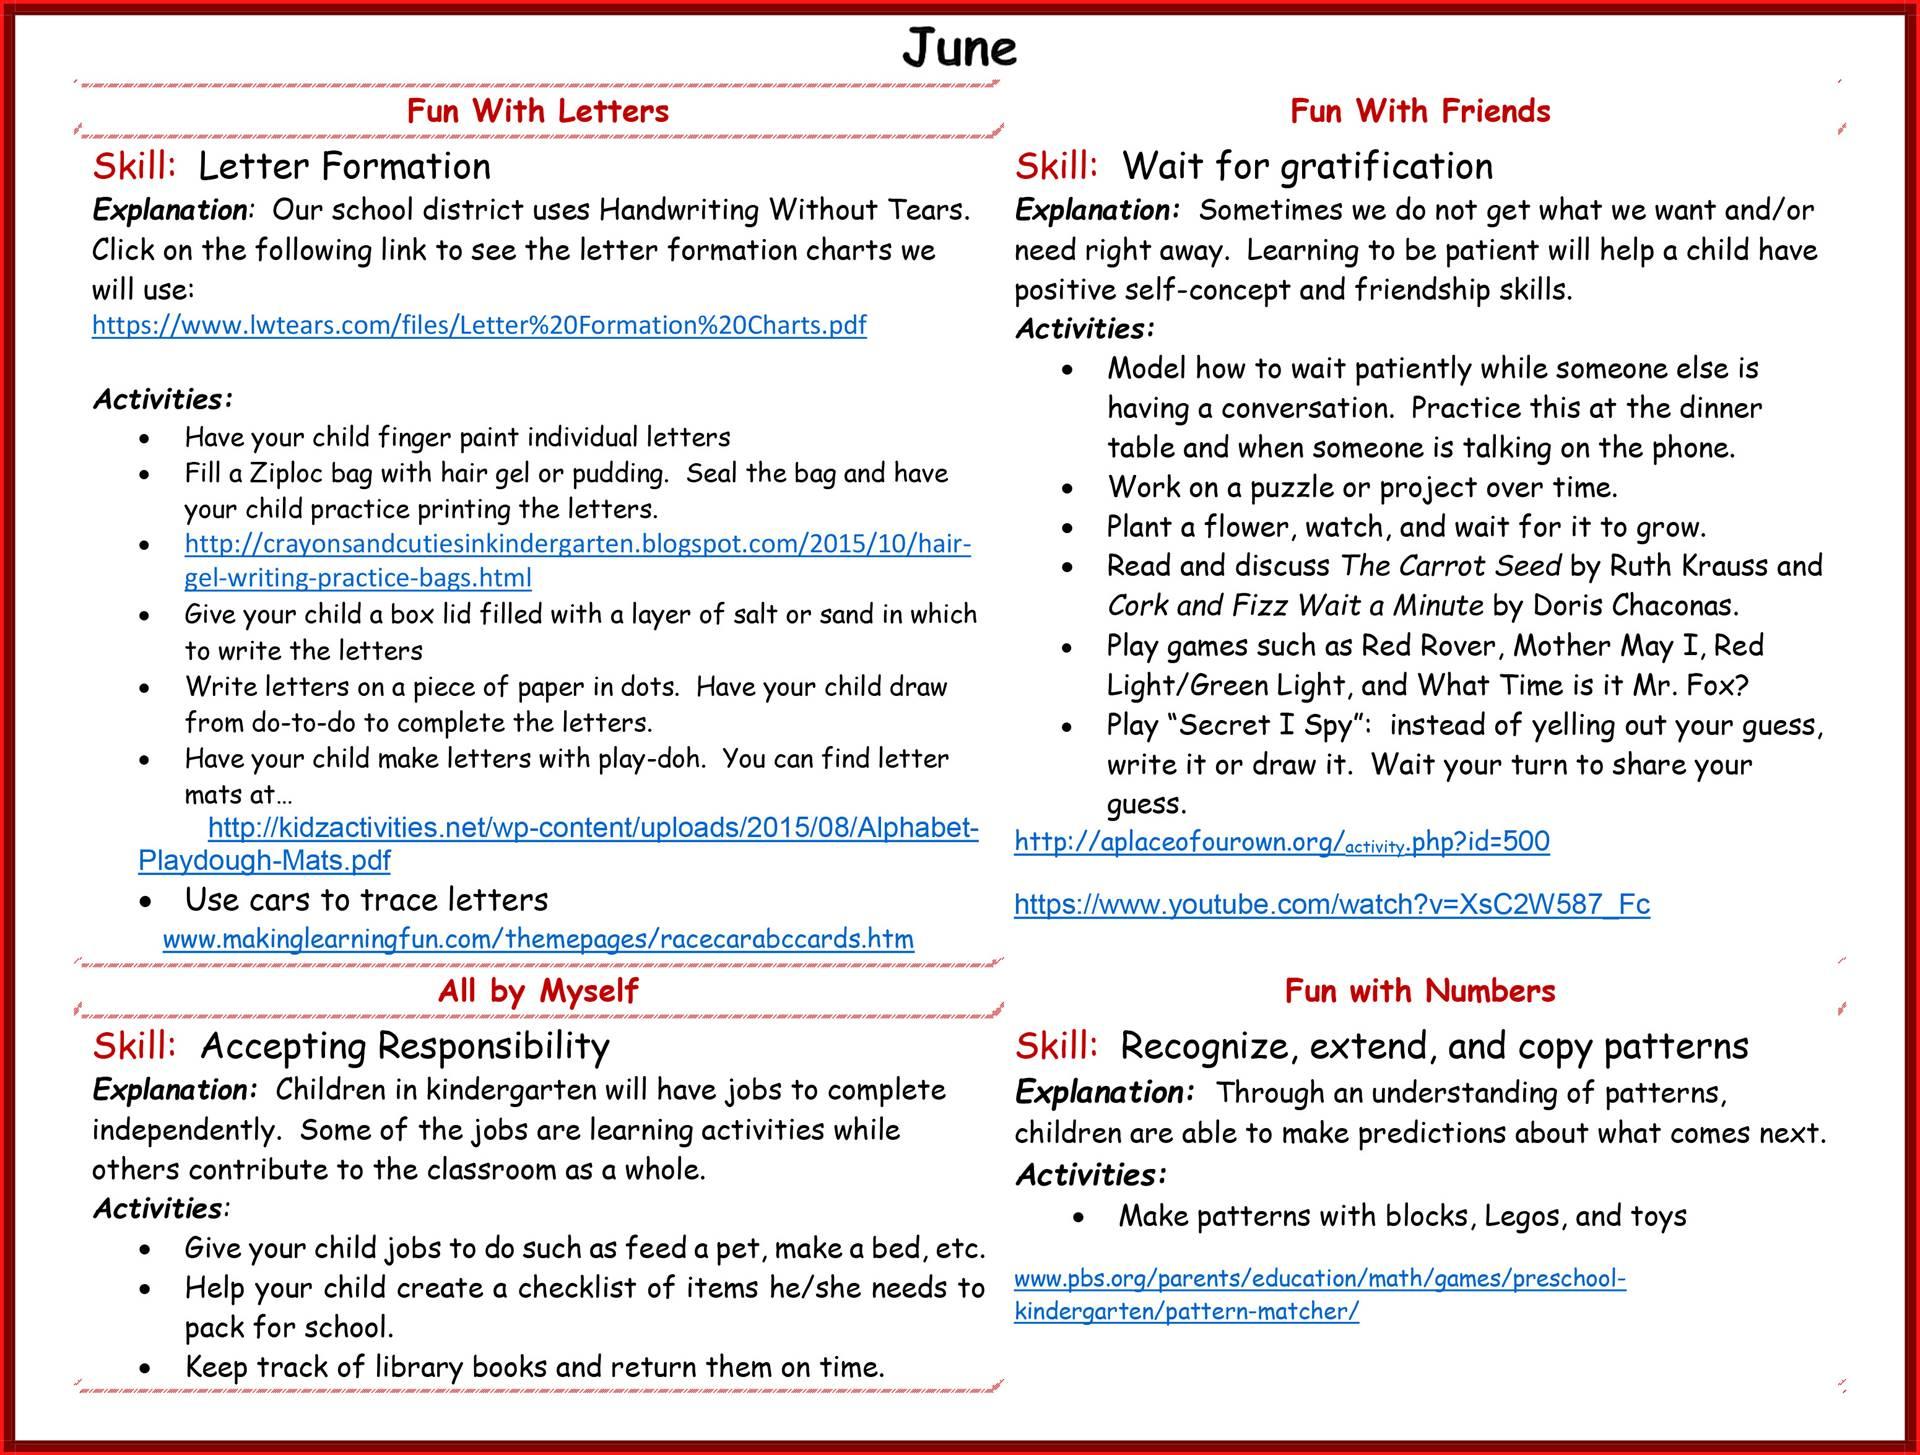 Kindergarten Readiness Calendar - June page 2